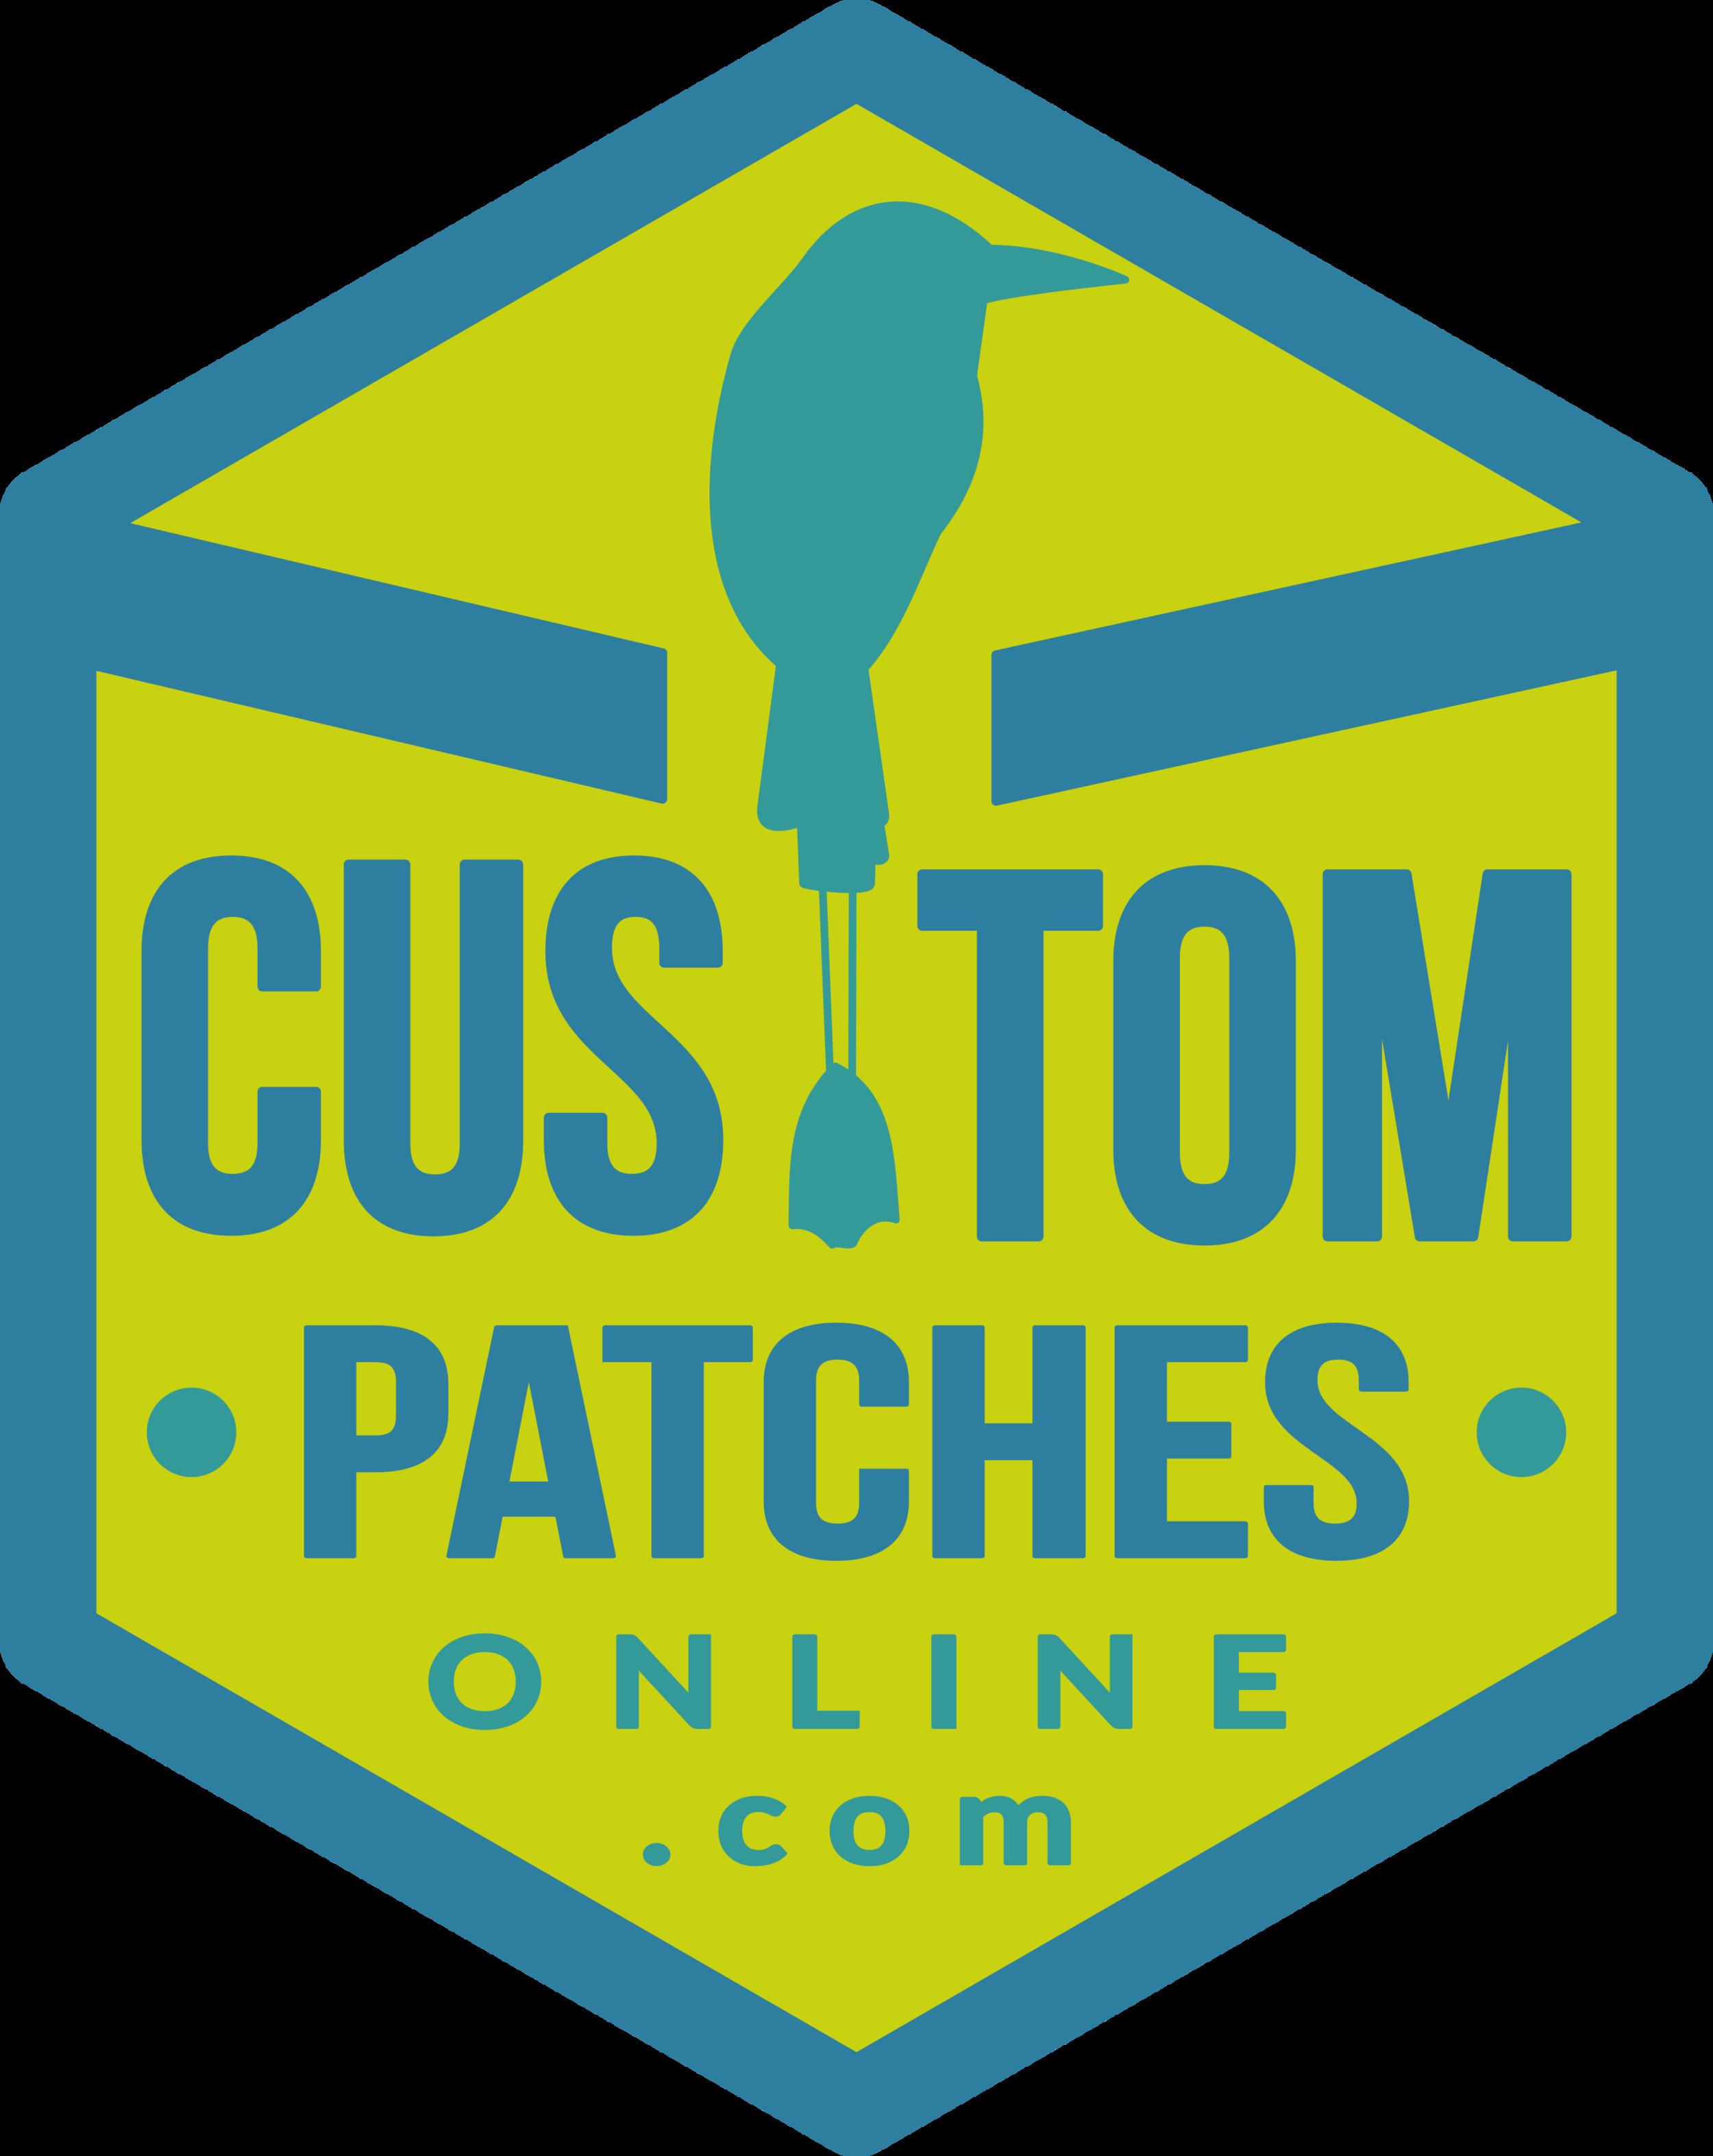 custompatchesonline (5).png